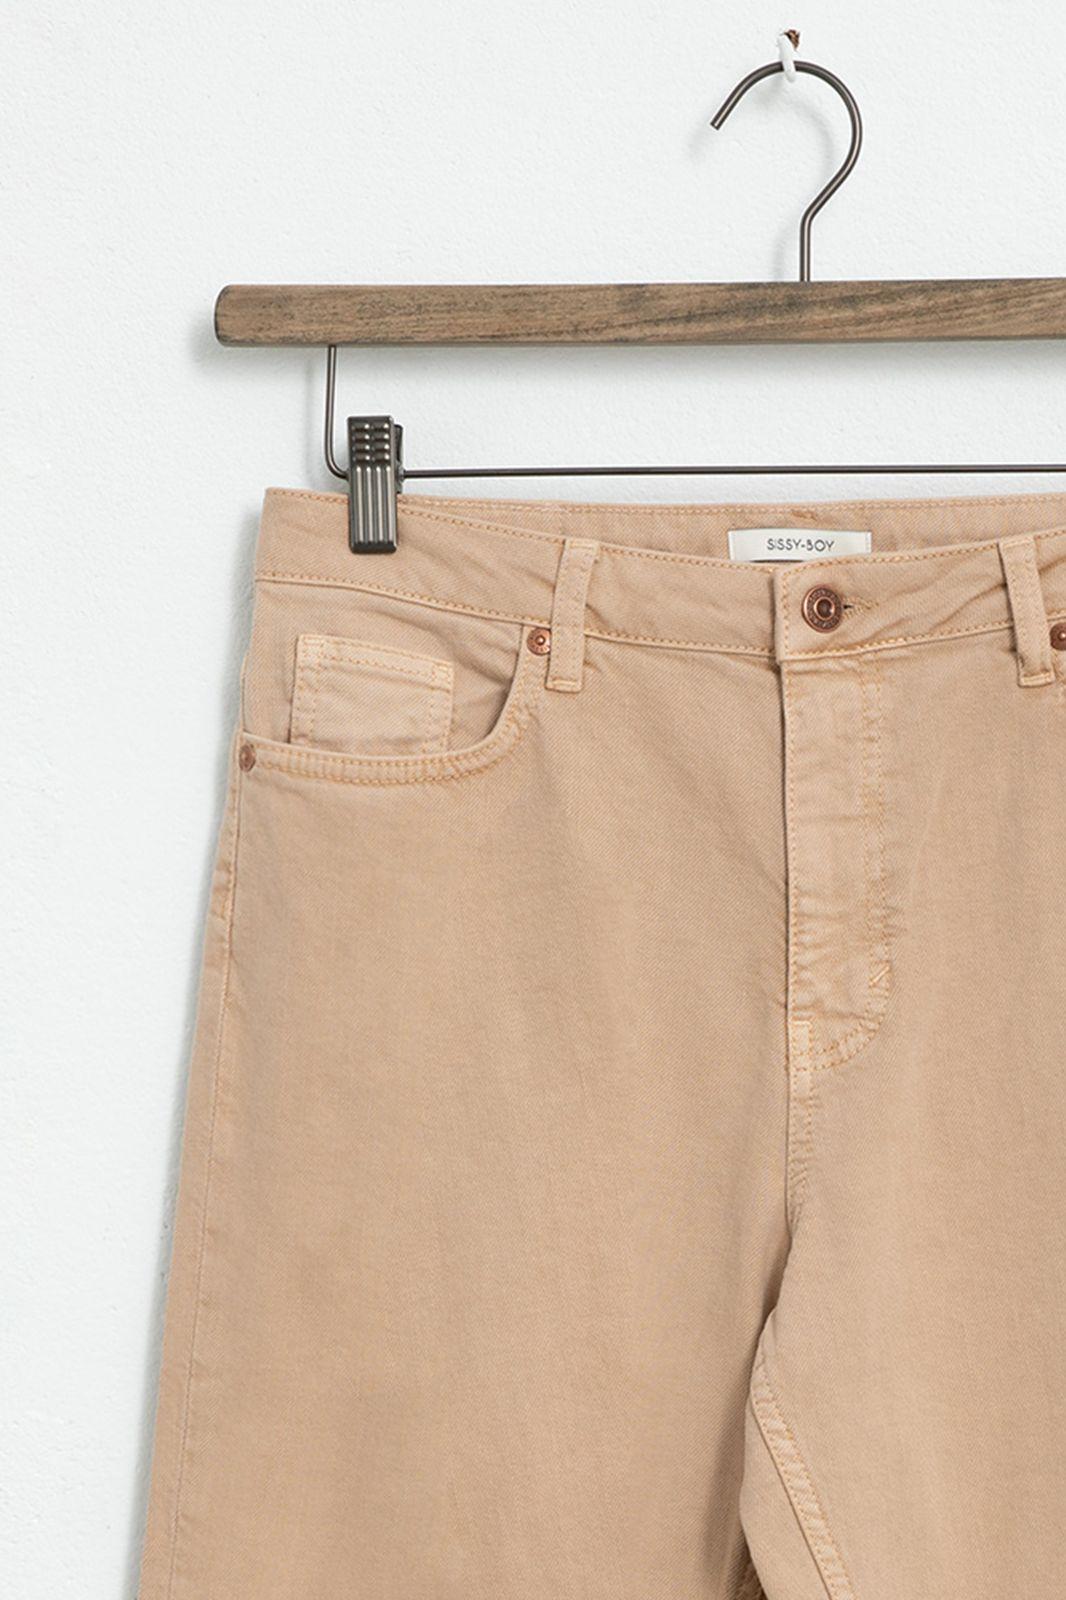 Beige high waist 5-pocket jeans